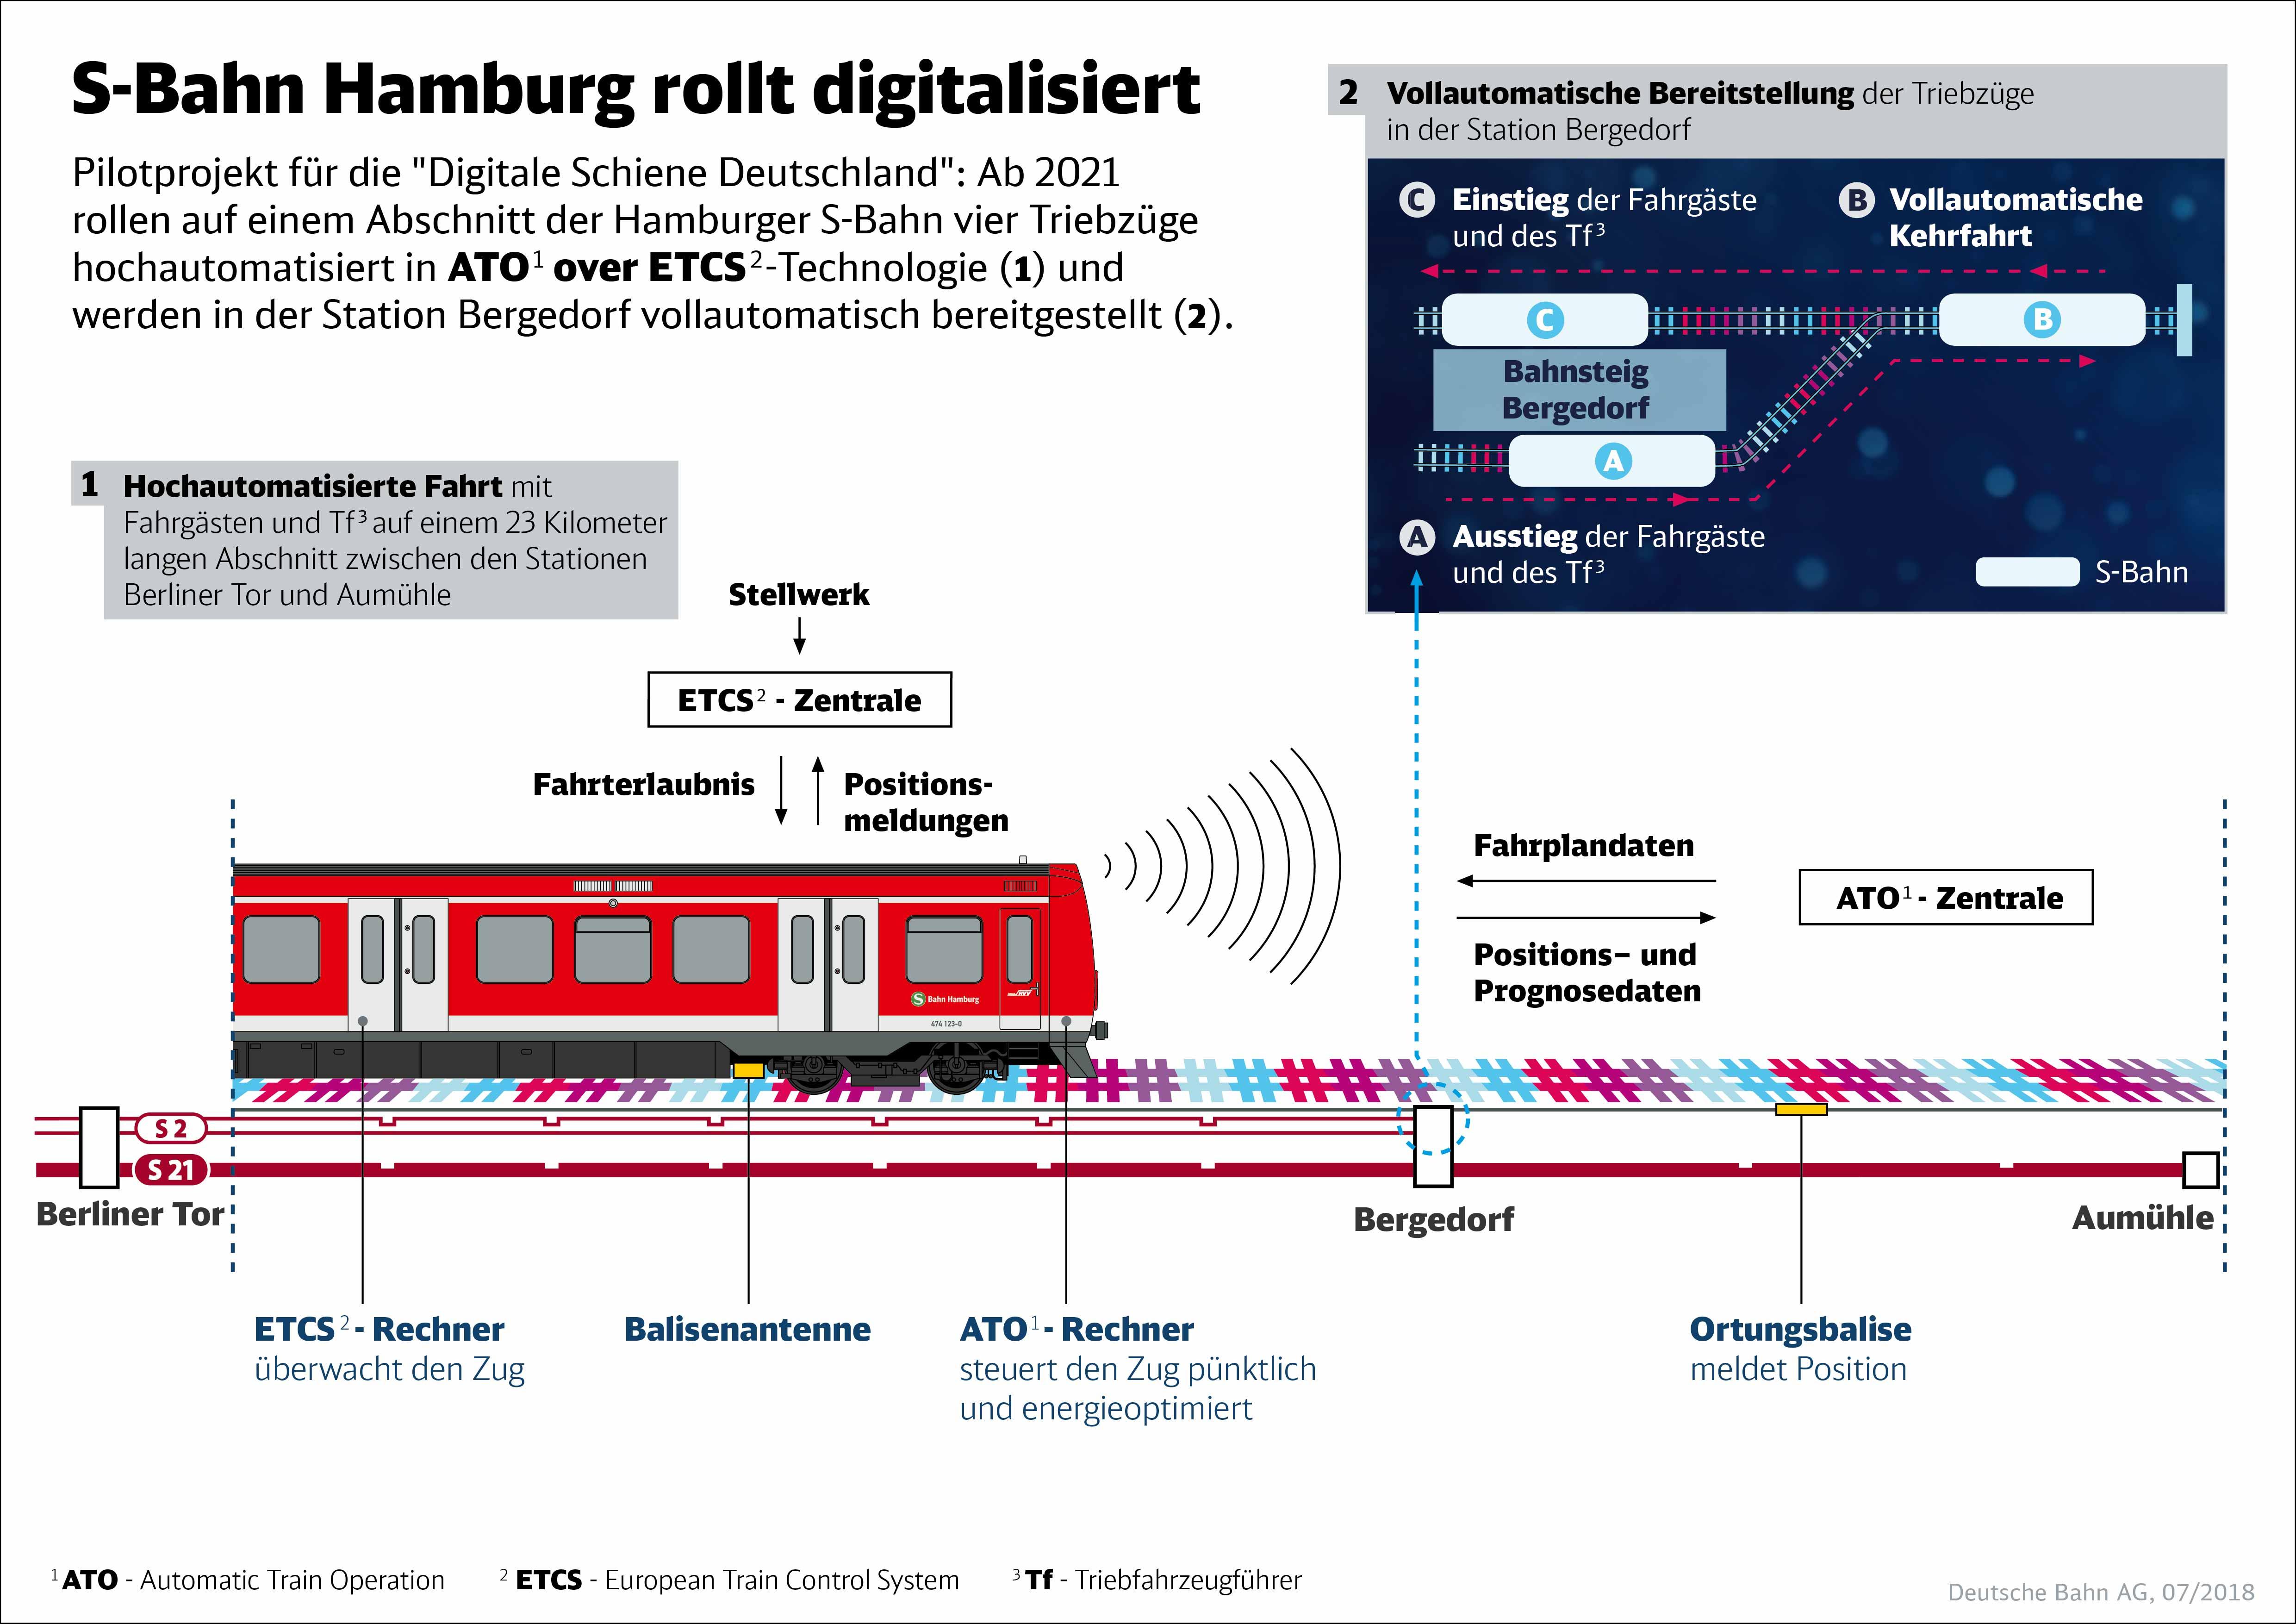 Infografik-S-Bahn-Hamburg-rollt-digitalisiertD-data.jpg